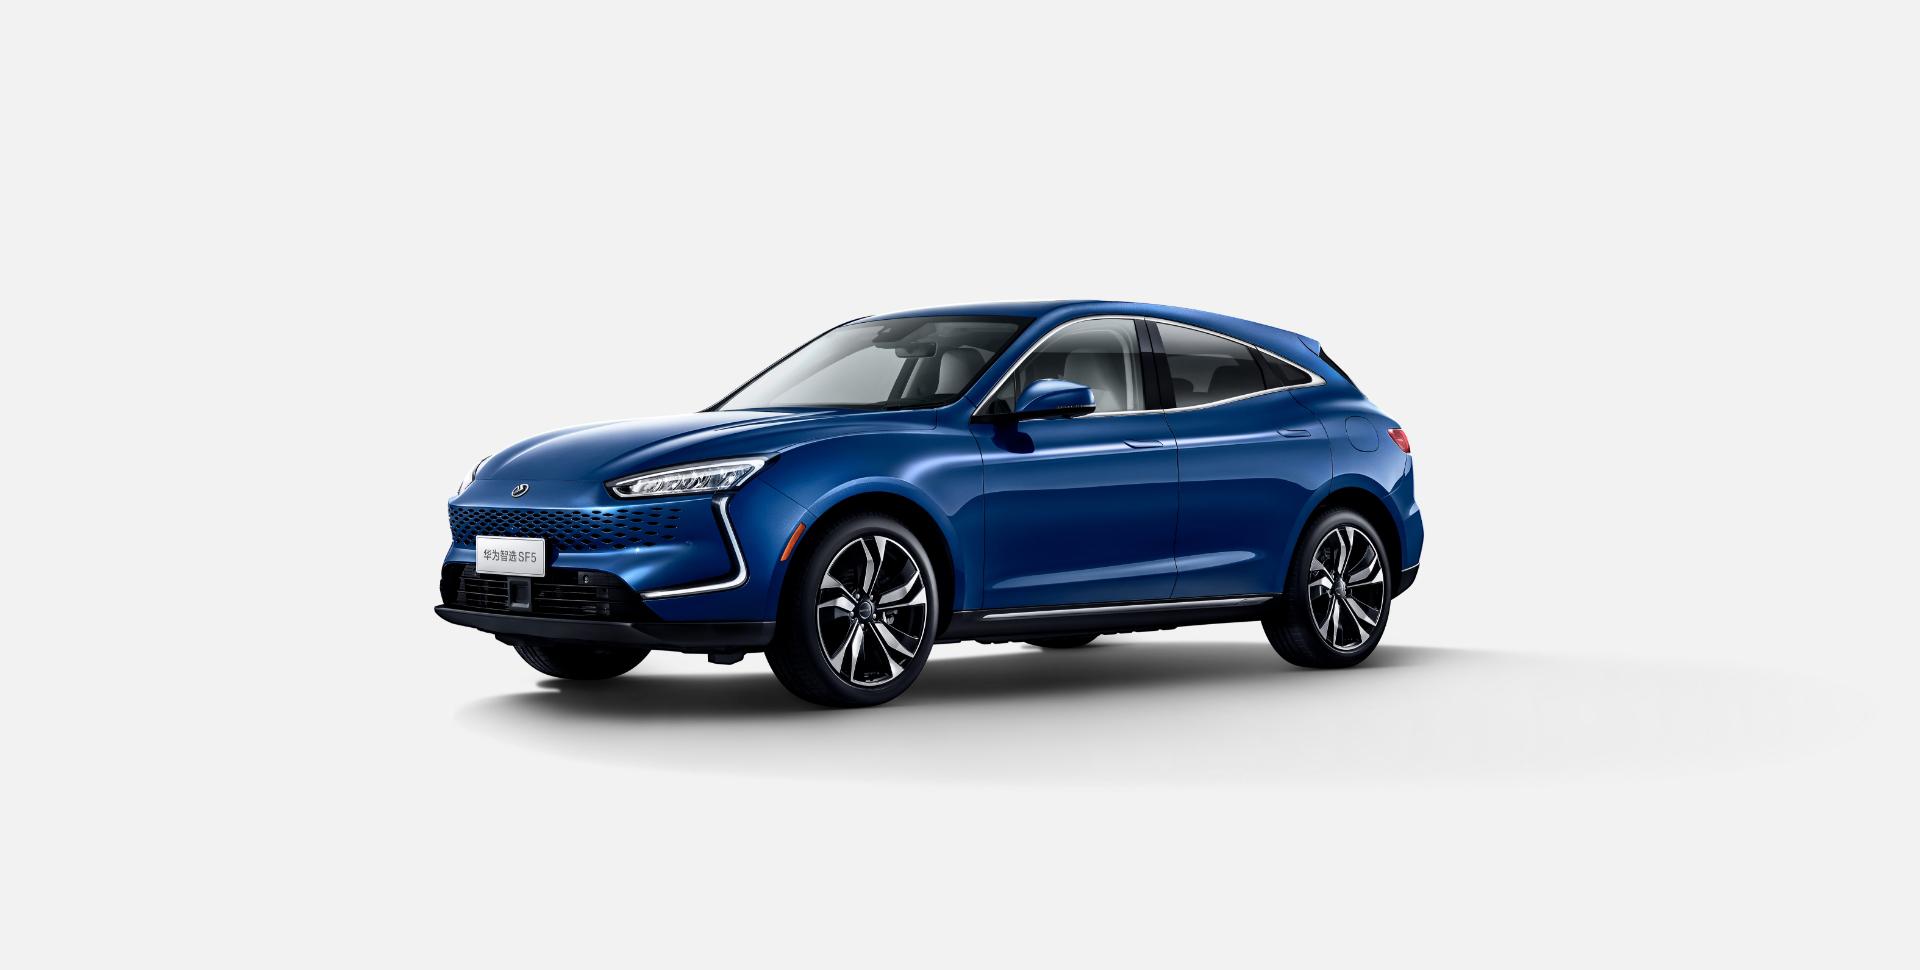 Cyrus-Huawei-Smart-Selection-SF5-erstes-Hybrid-Elektroauto-mit-Huawei-Beteiligung-startet-in-China